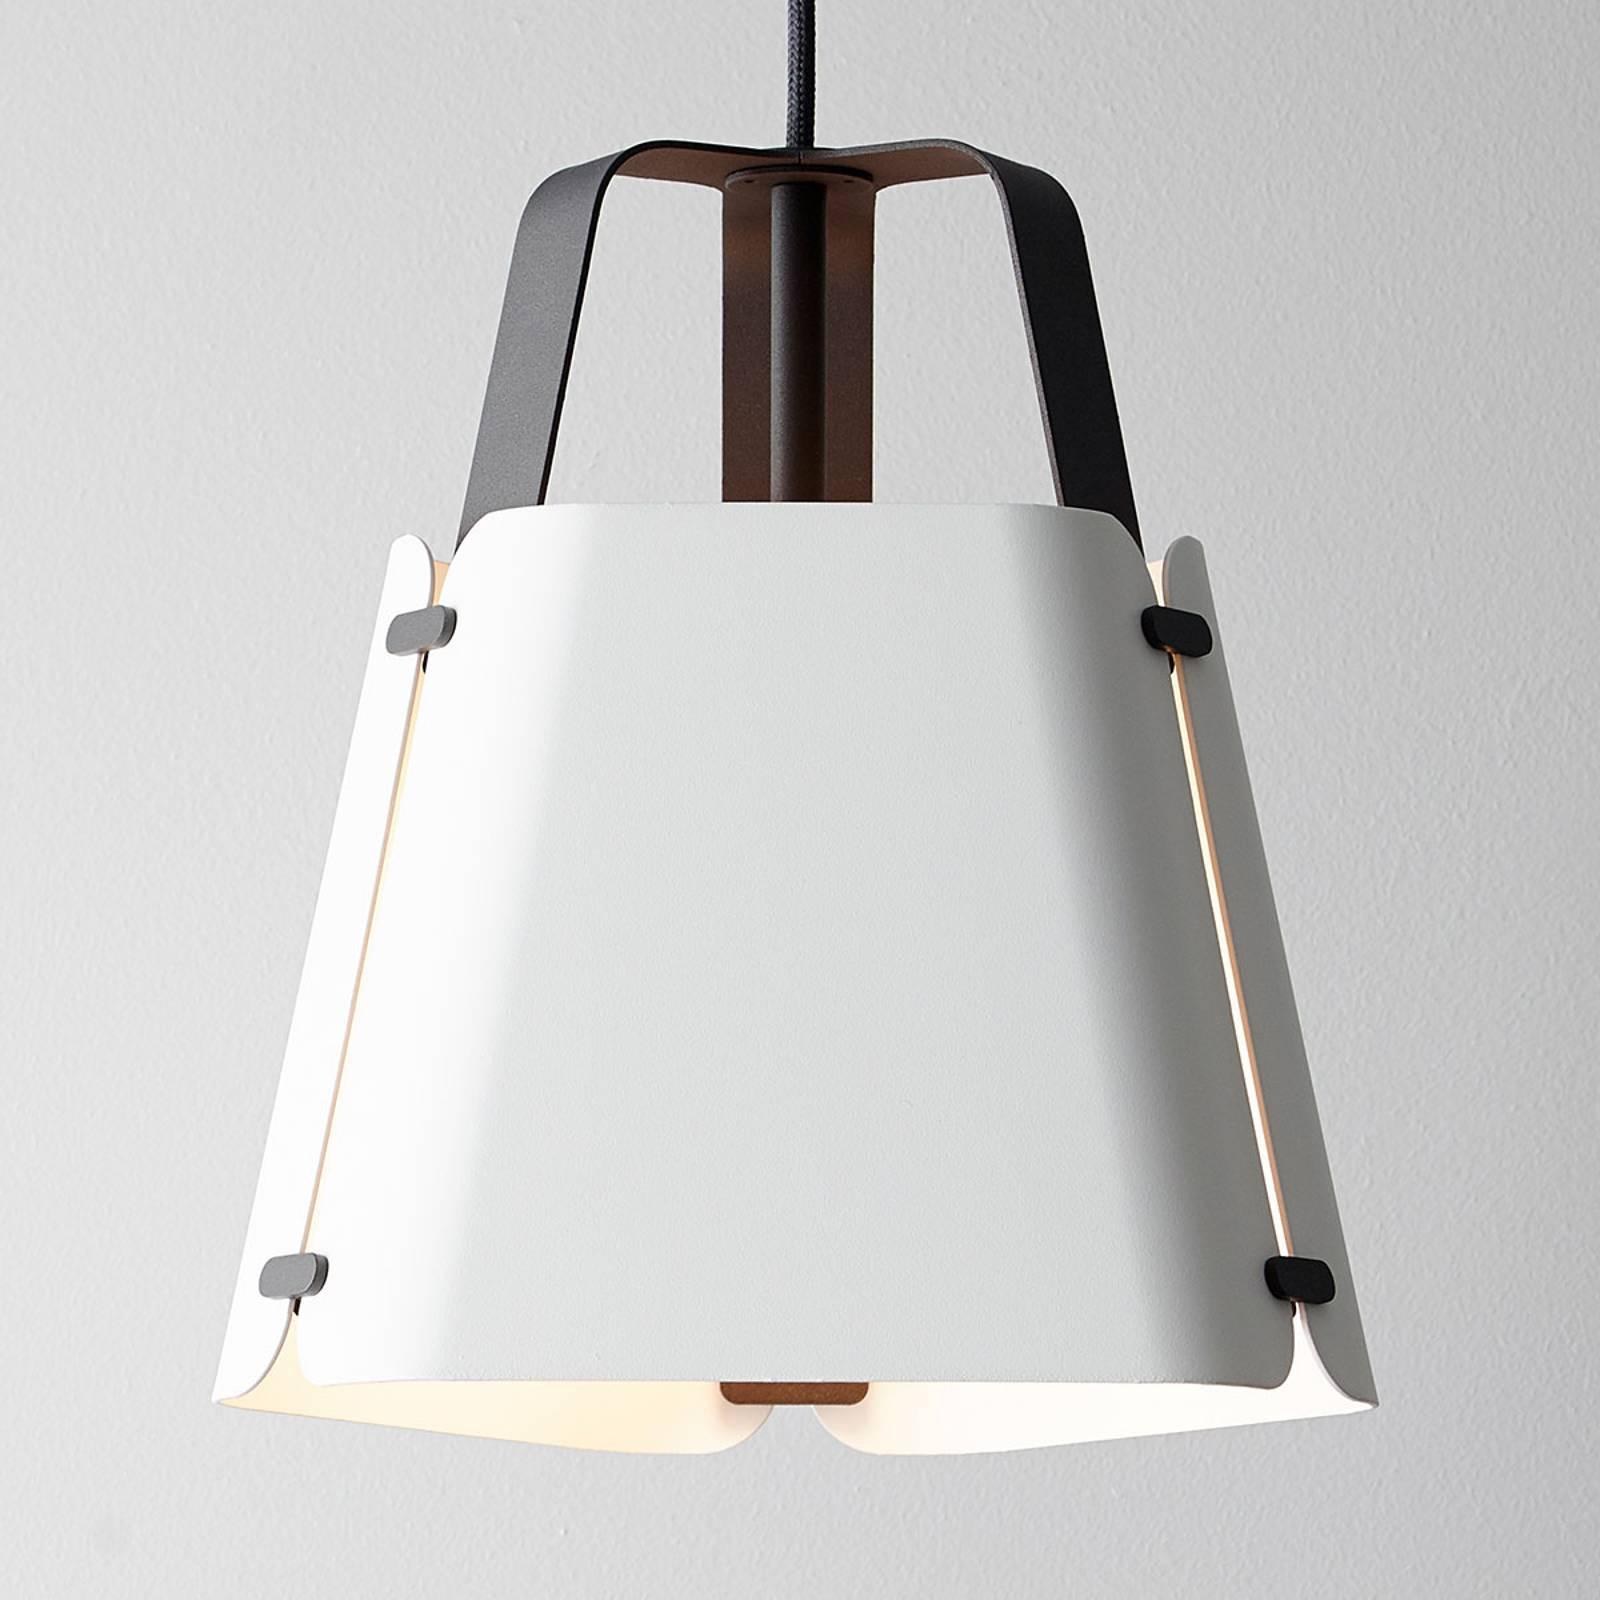 Suspension LED Fold, blanche, 27,5cm